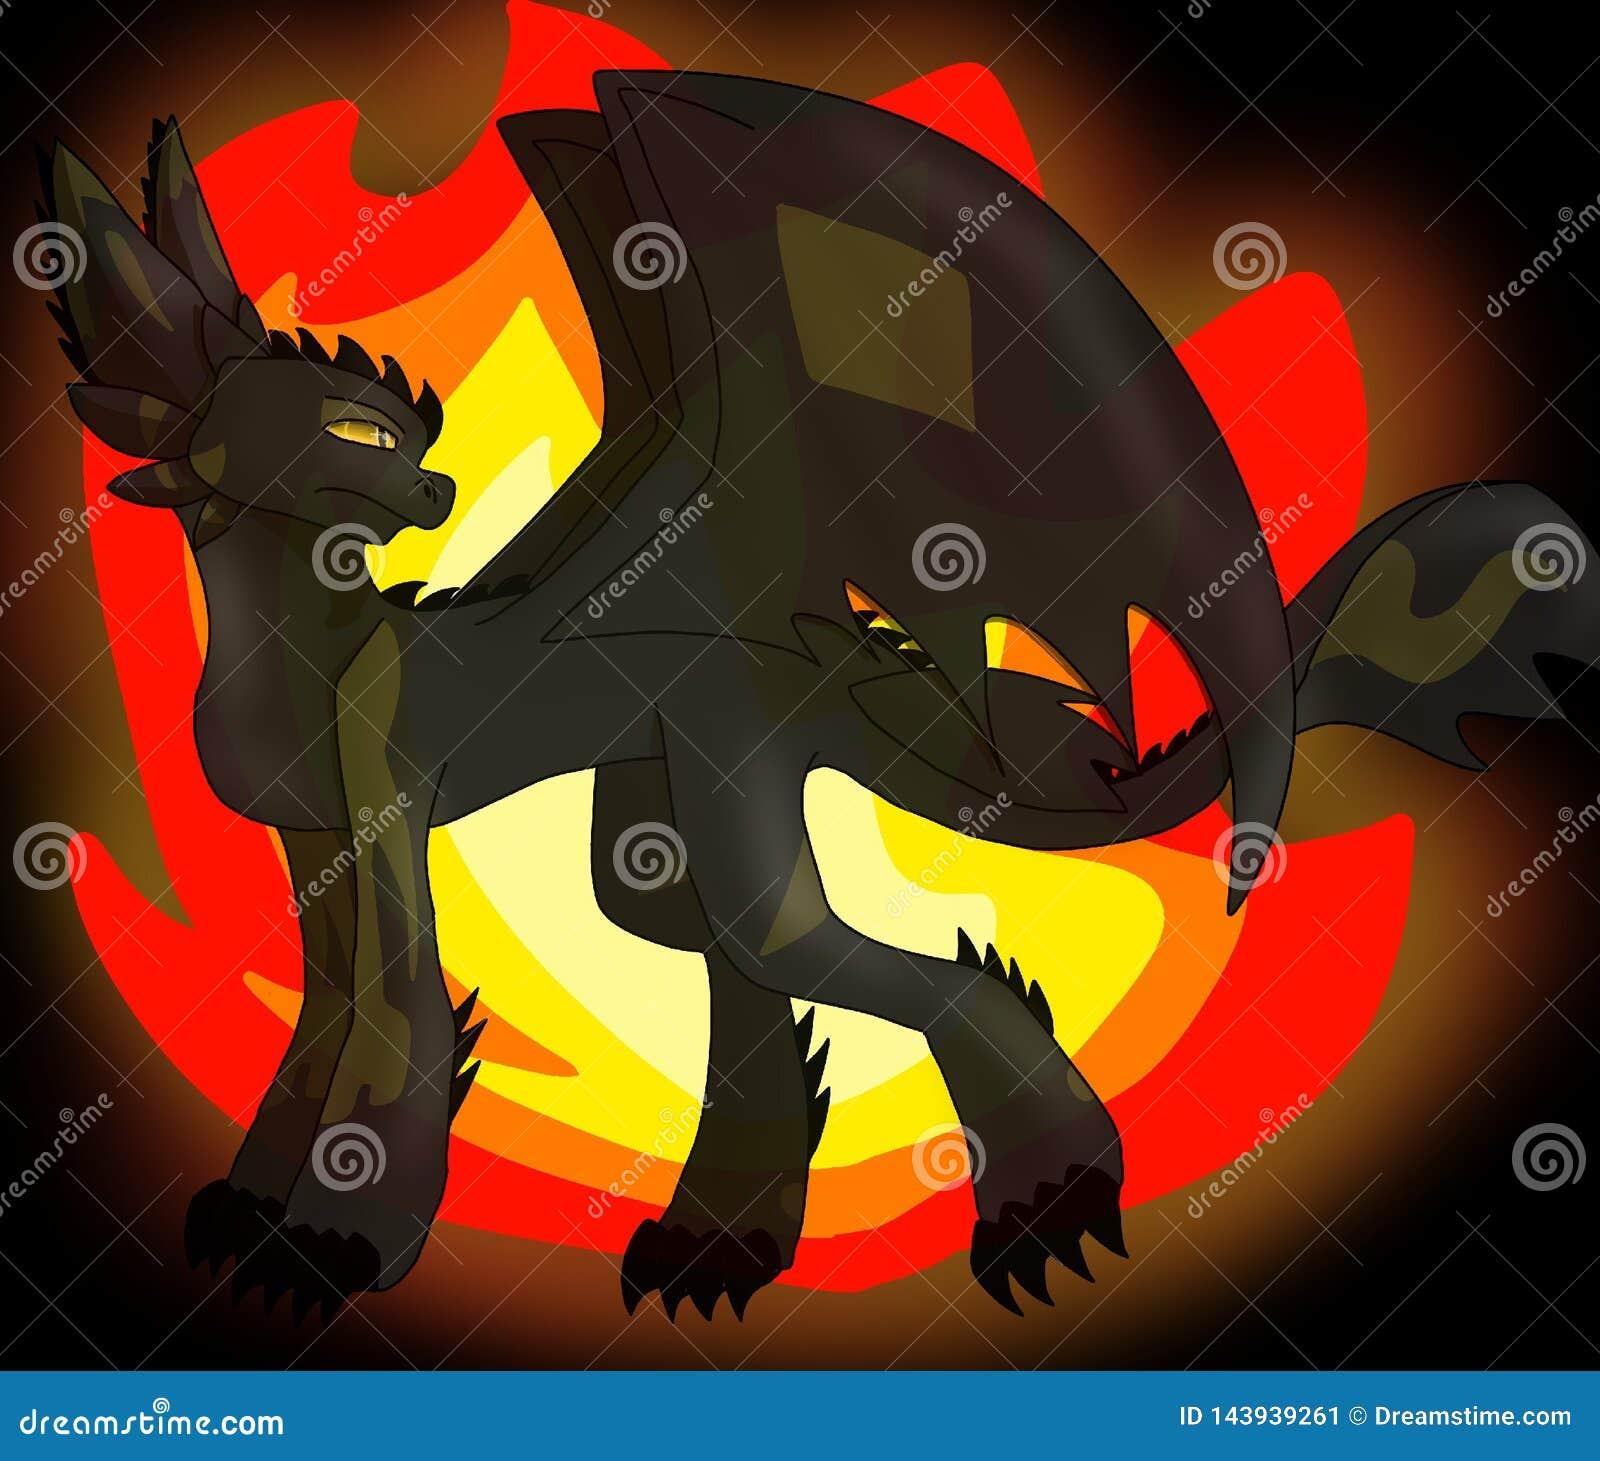 Artwork of Swift Wing - fire dragon